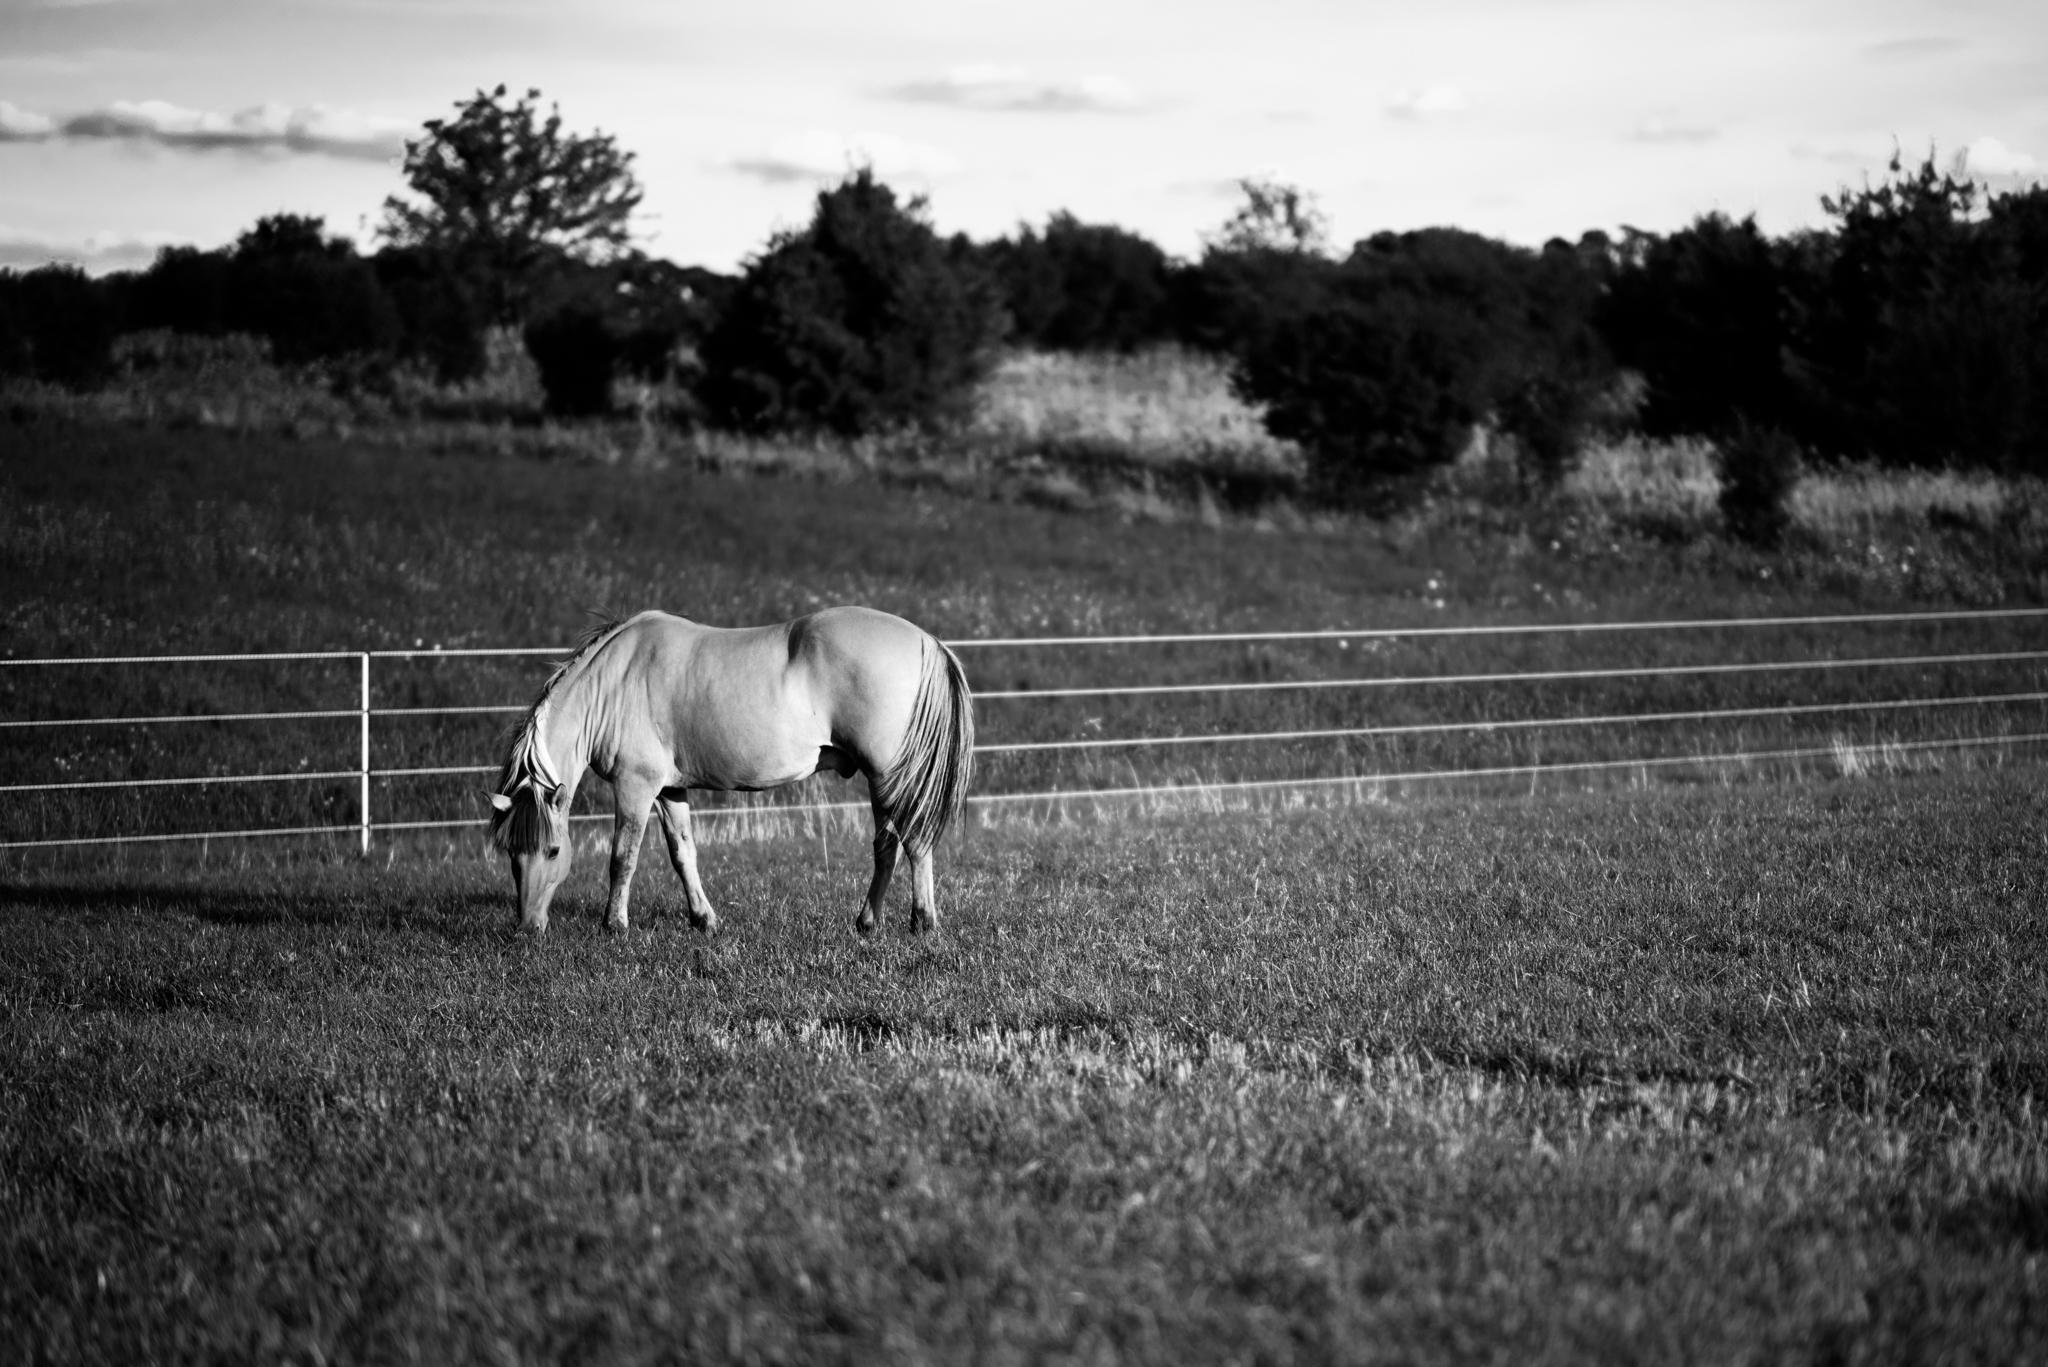 013_Horse_2016-08.jpg